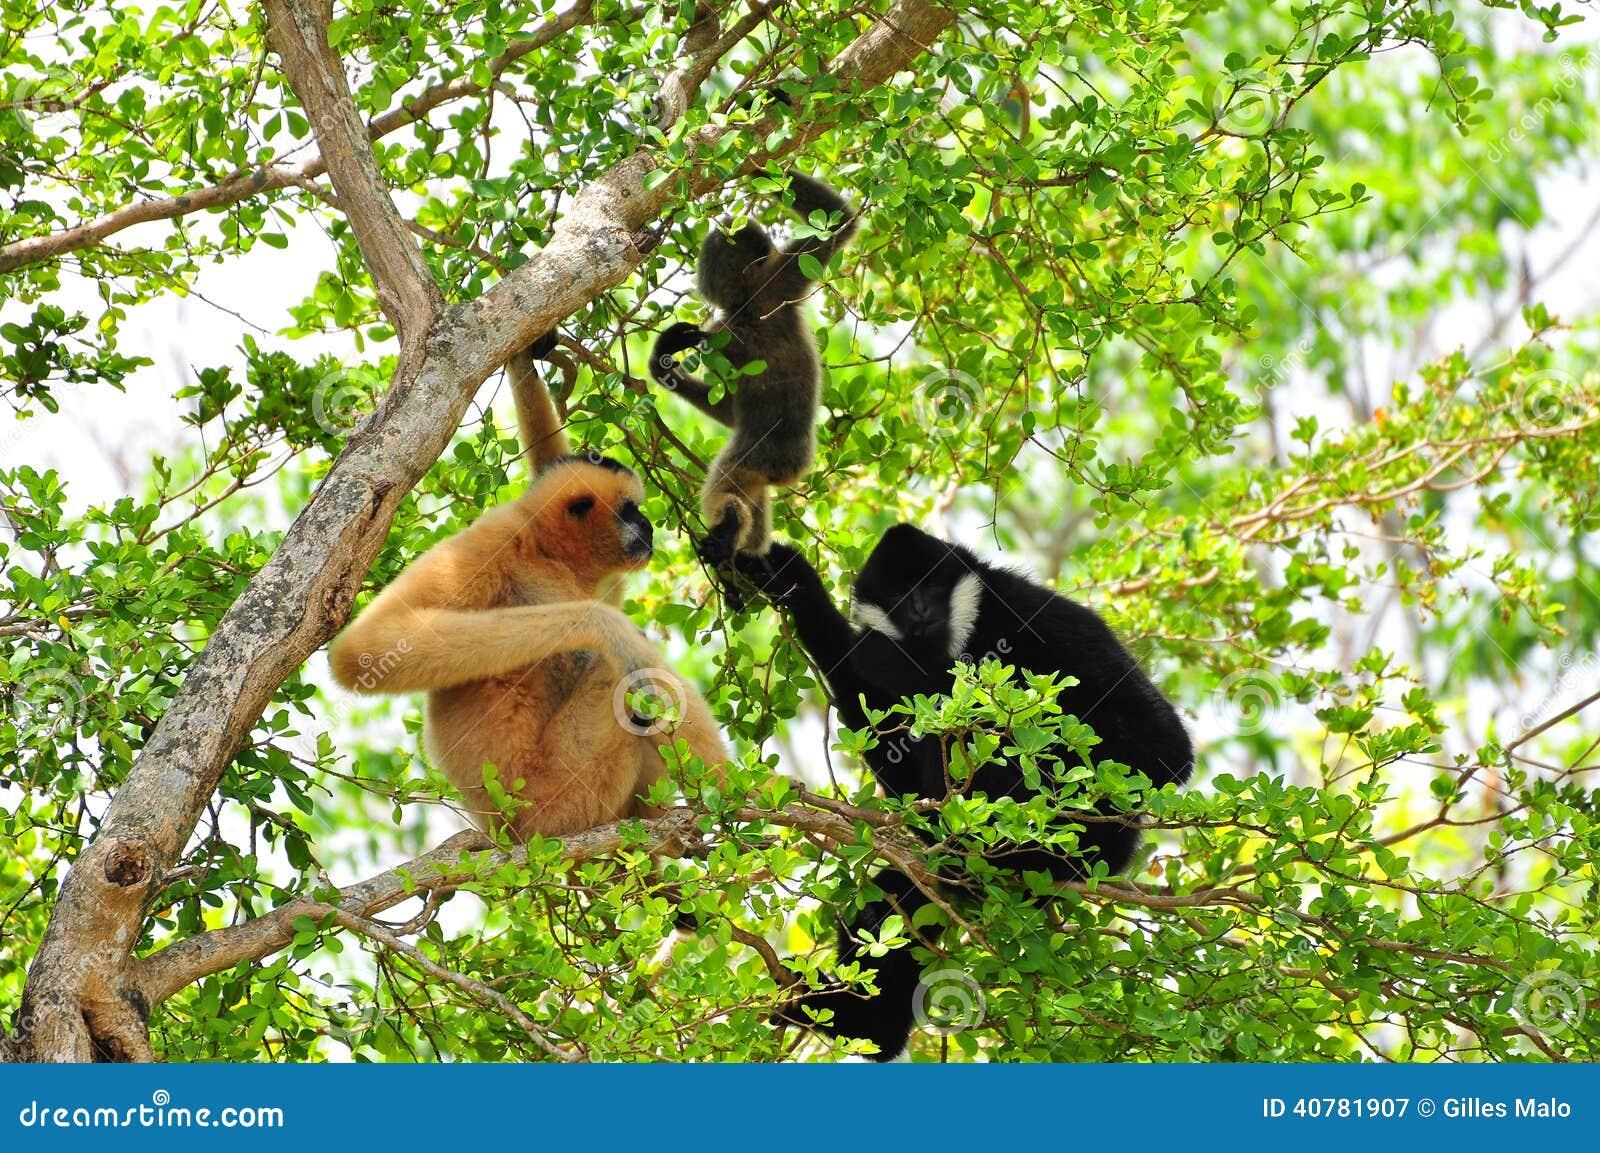 gibbon black single men Search for local single 50+ women  search single 50+ men | search single 50+ women gmakate gibbon, ne 63 years old view profile send message.